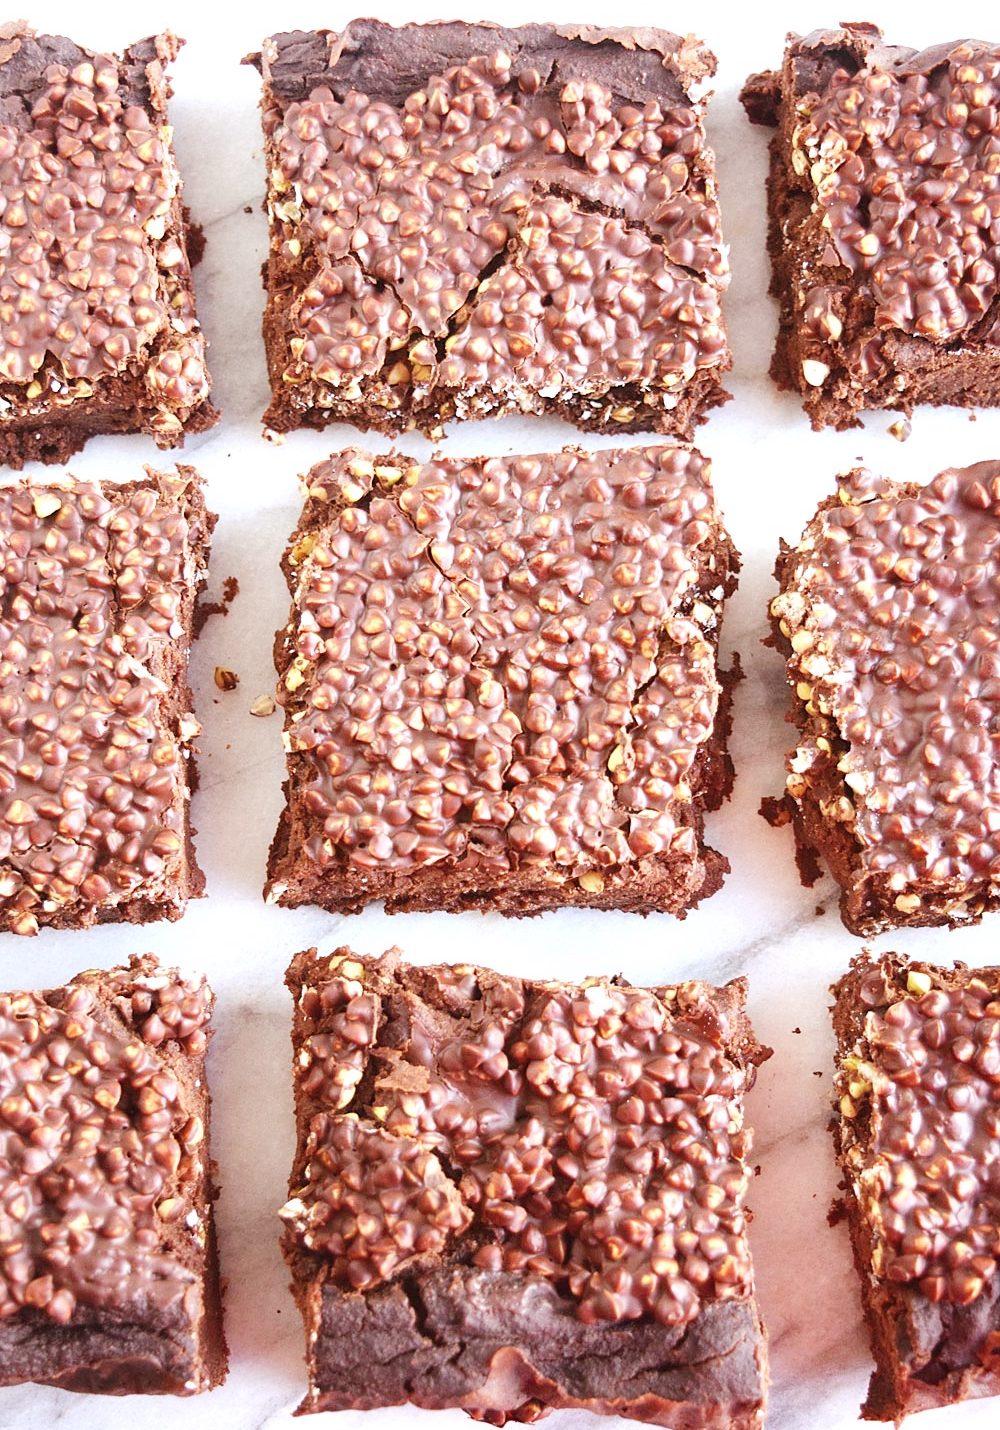 Vegan-Crunch-Brownies-3-1